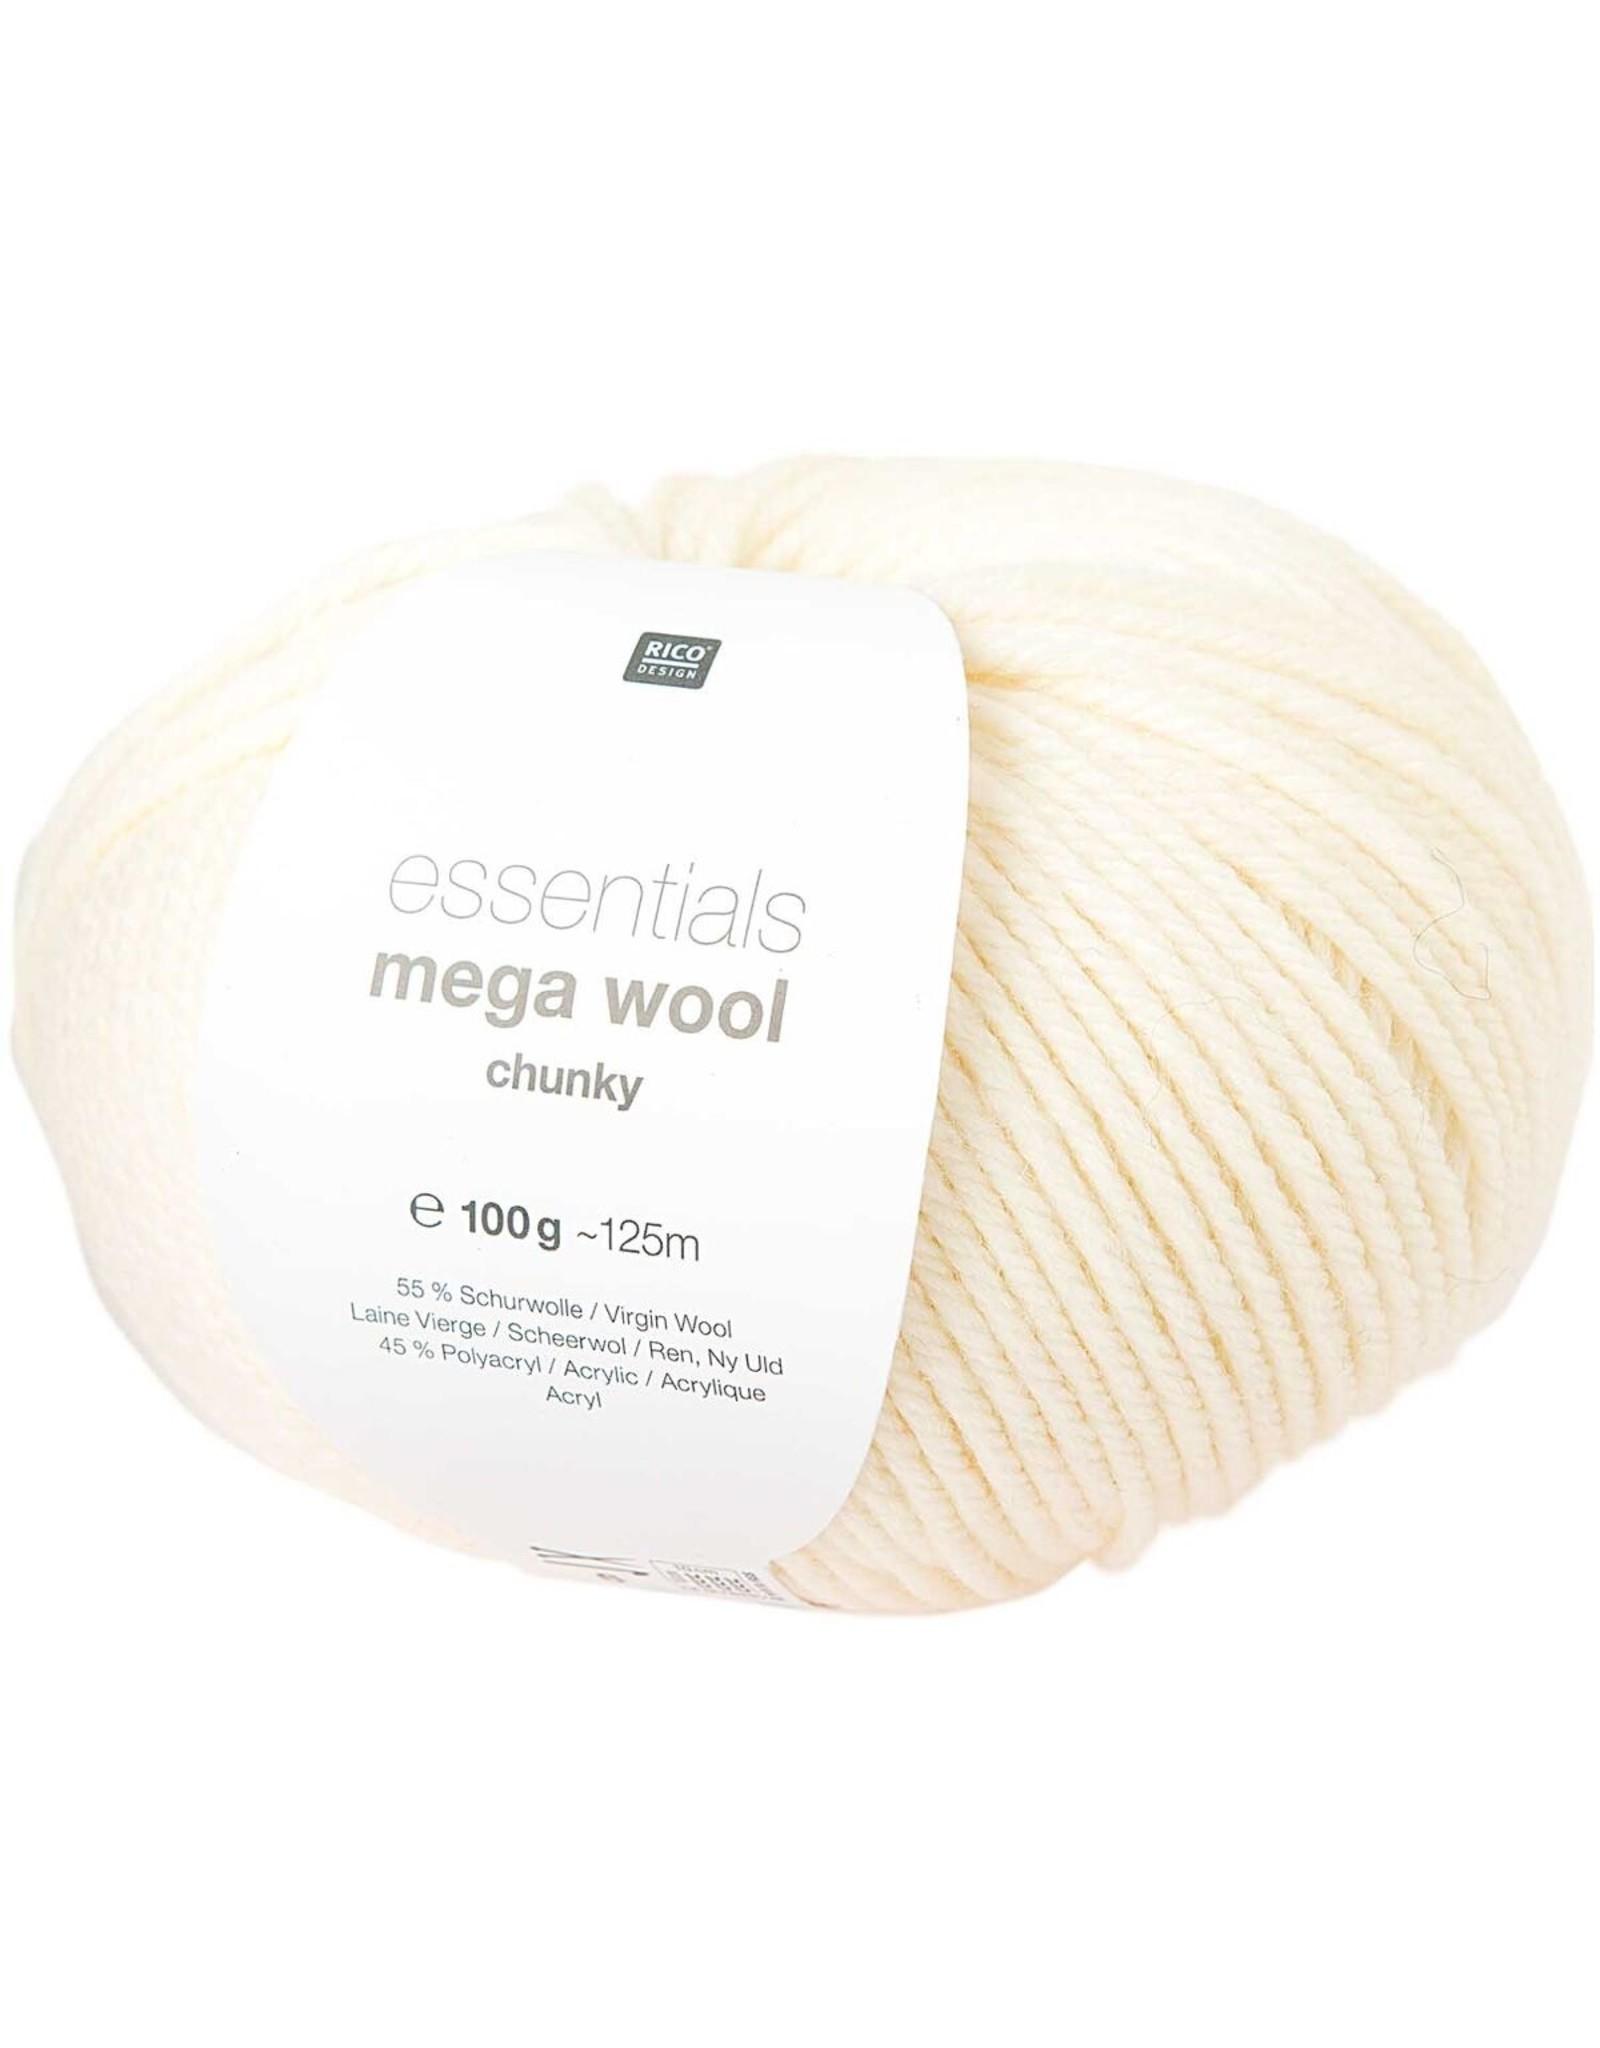 Rico Rico Essentials Mega Wool Chunky